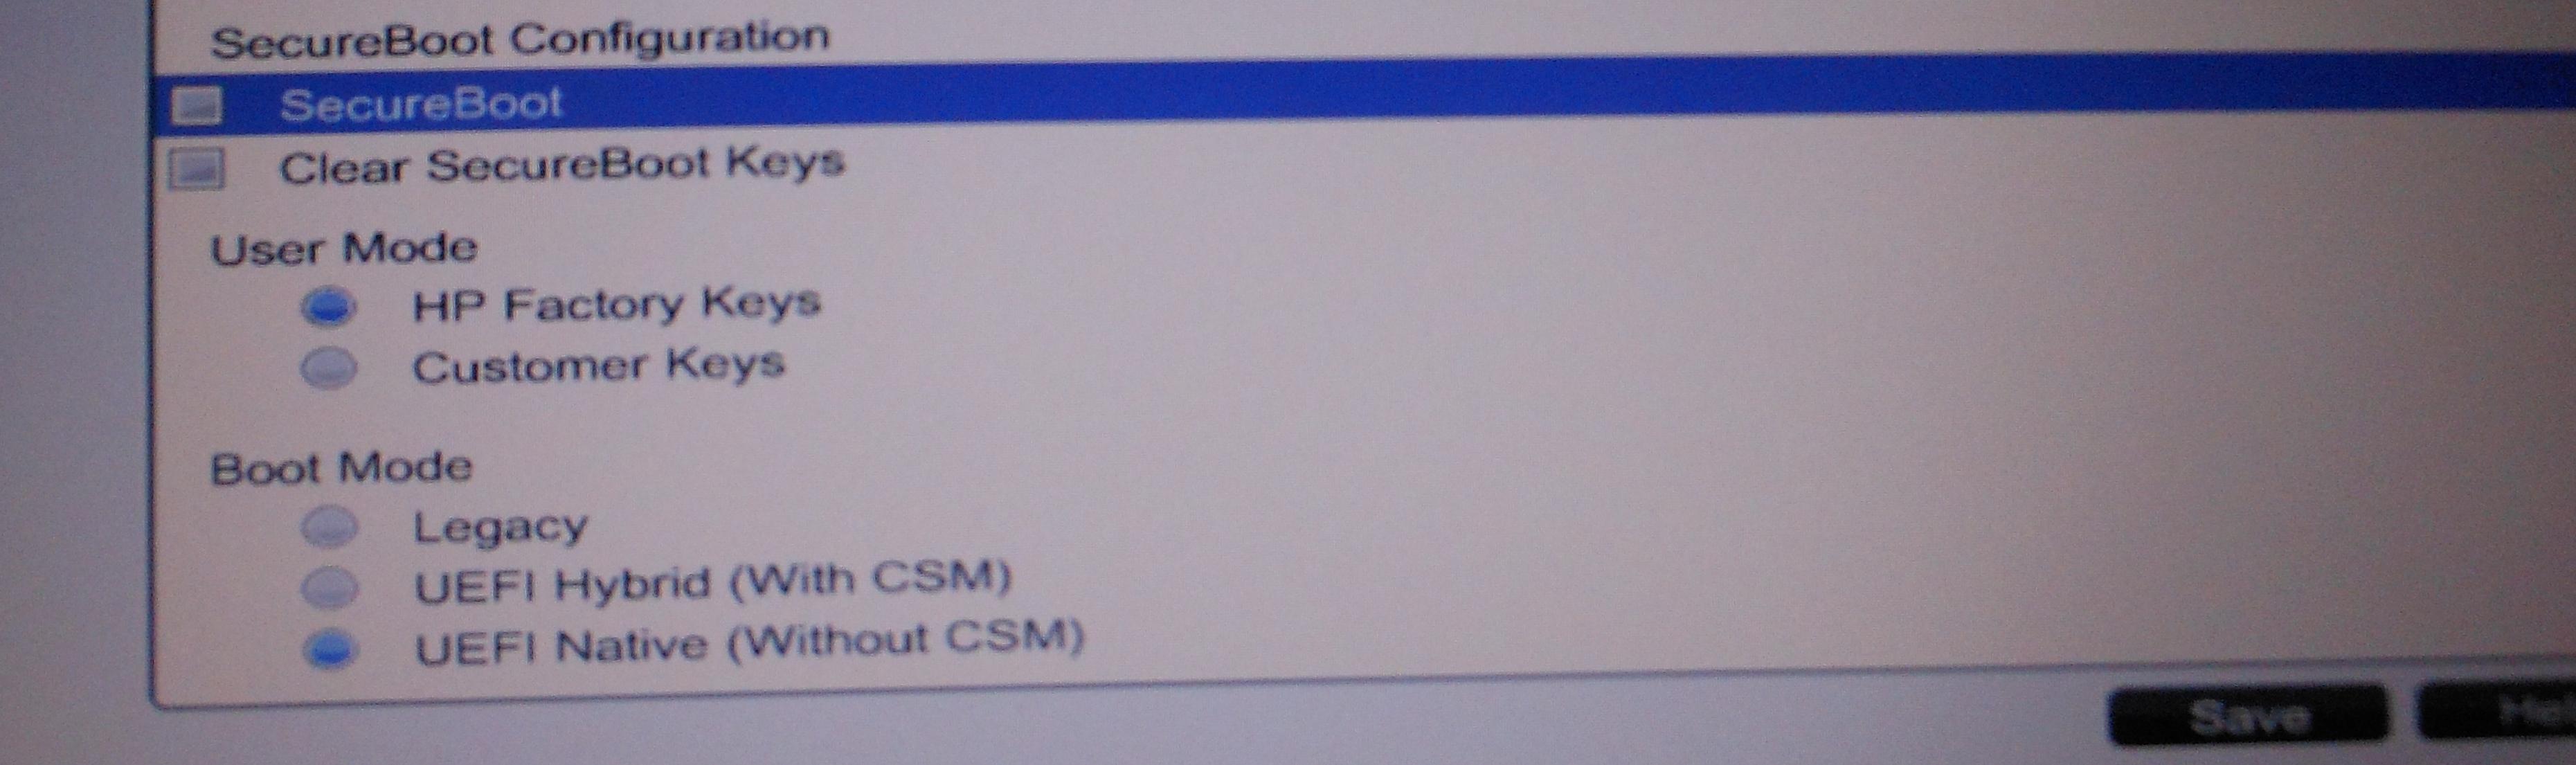 Installing Windows 7 on a UEFI Computer - BlueCompute